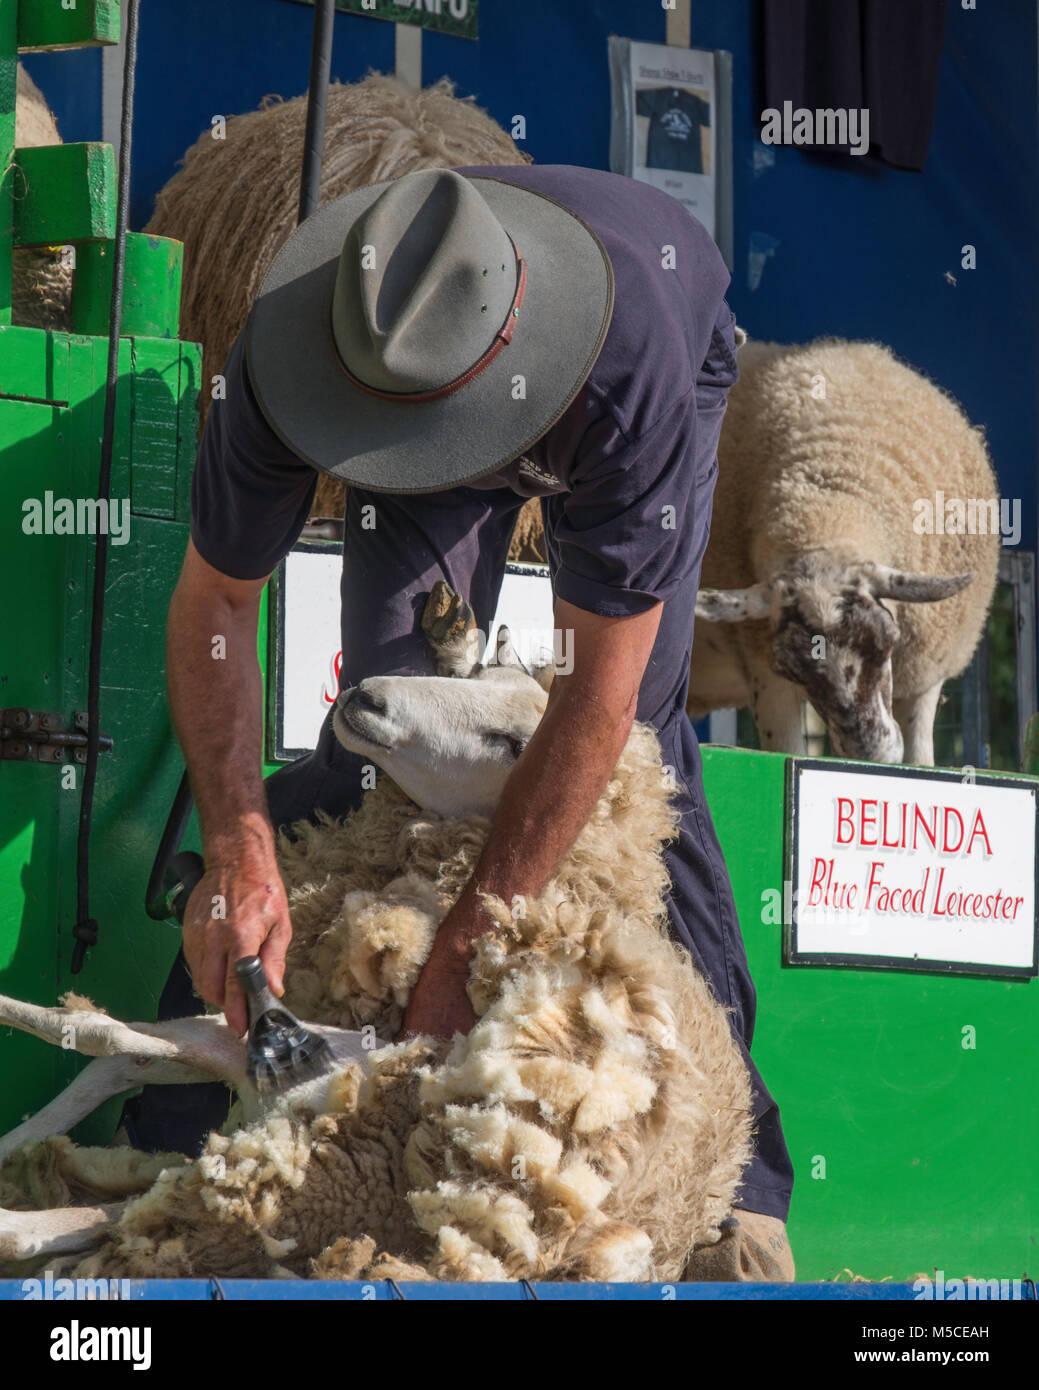 Sheep shearing demonstration at a countryside show. - Stock Image